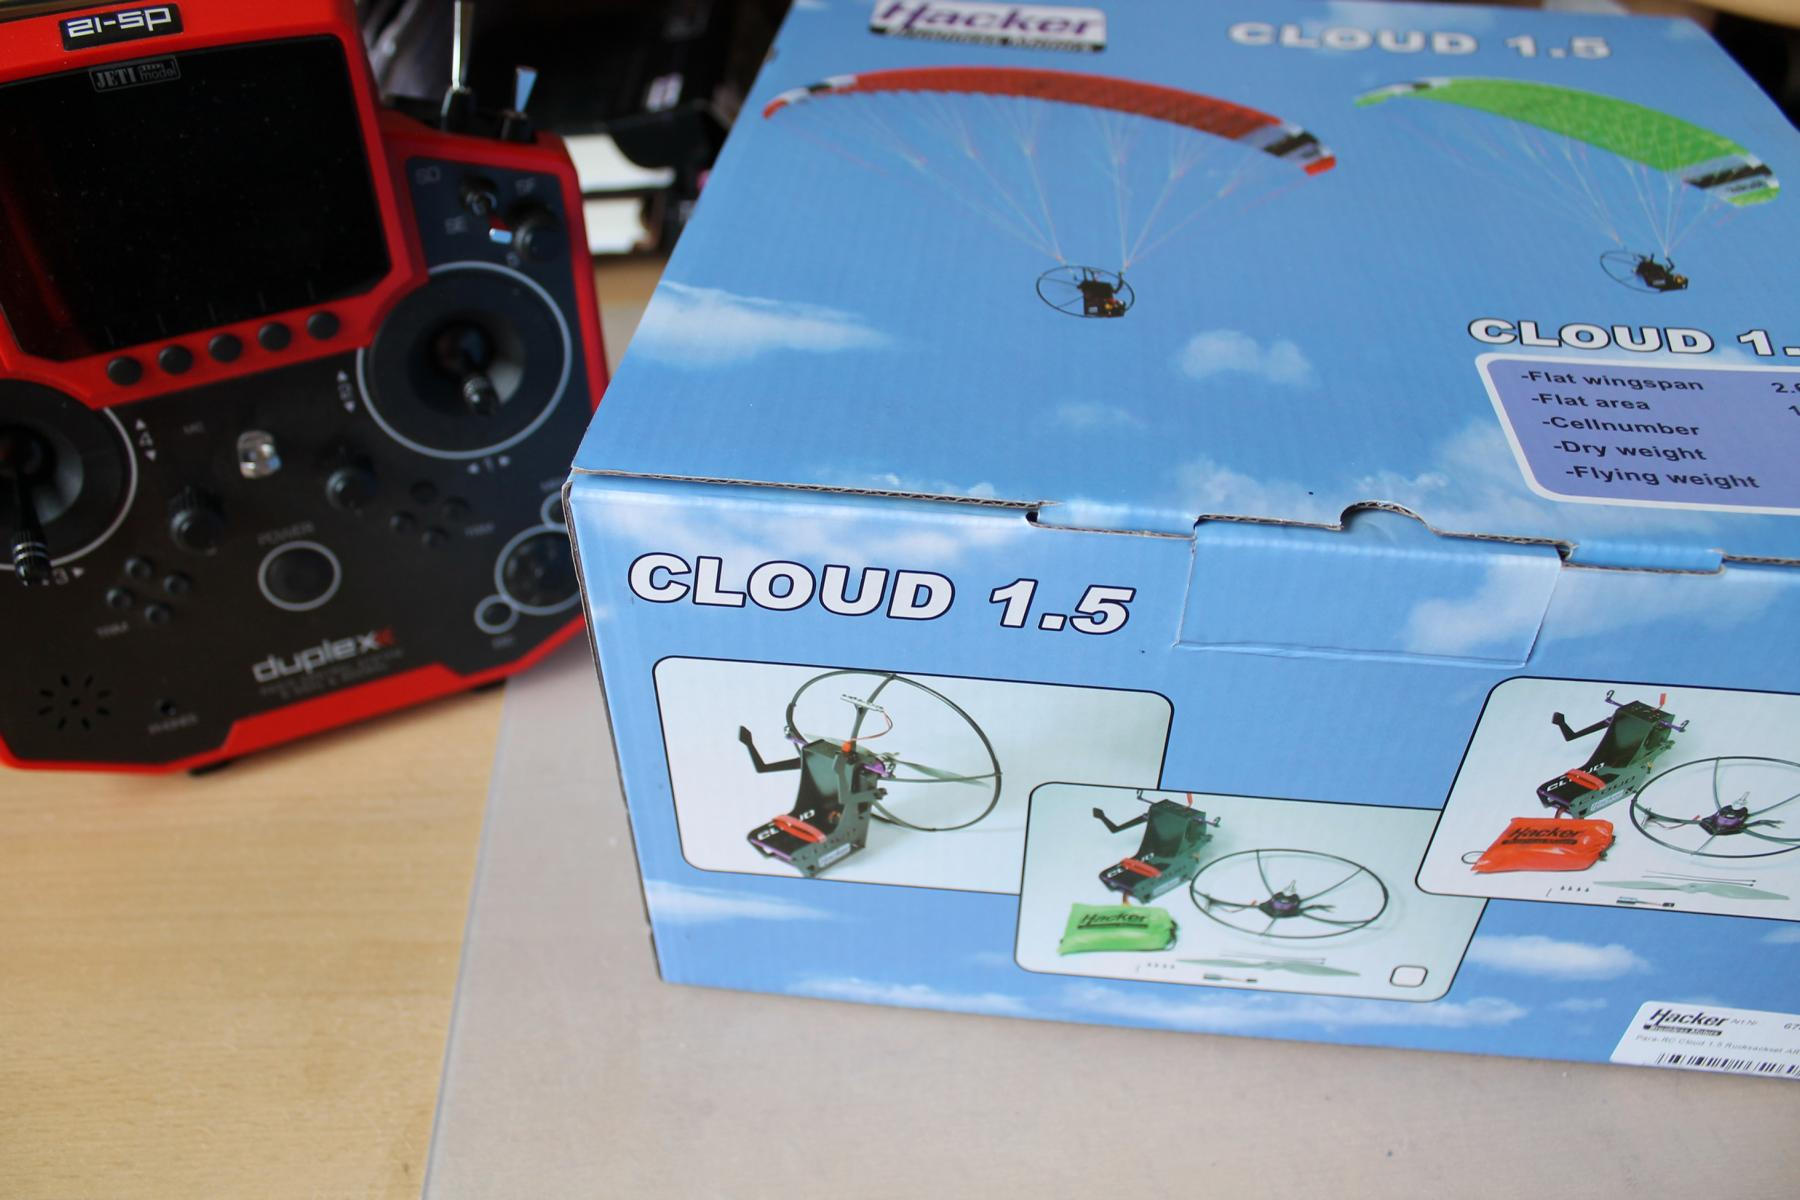 Para-RC Cloud 1.5 Komplettset ARF Hacker Motor